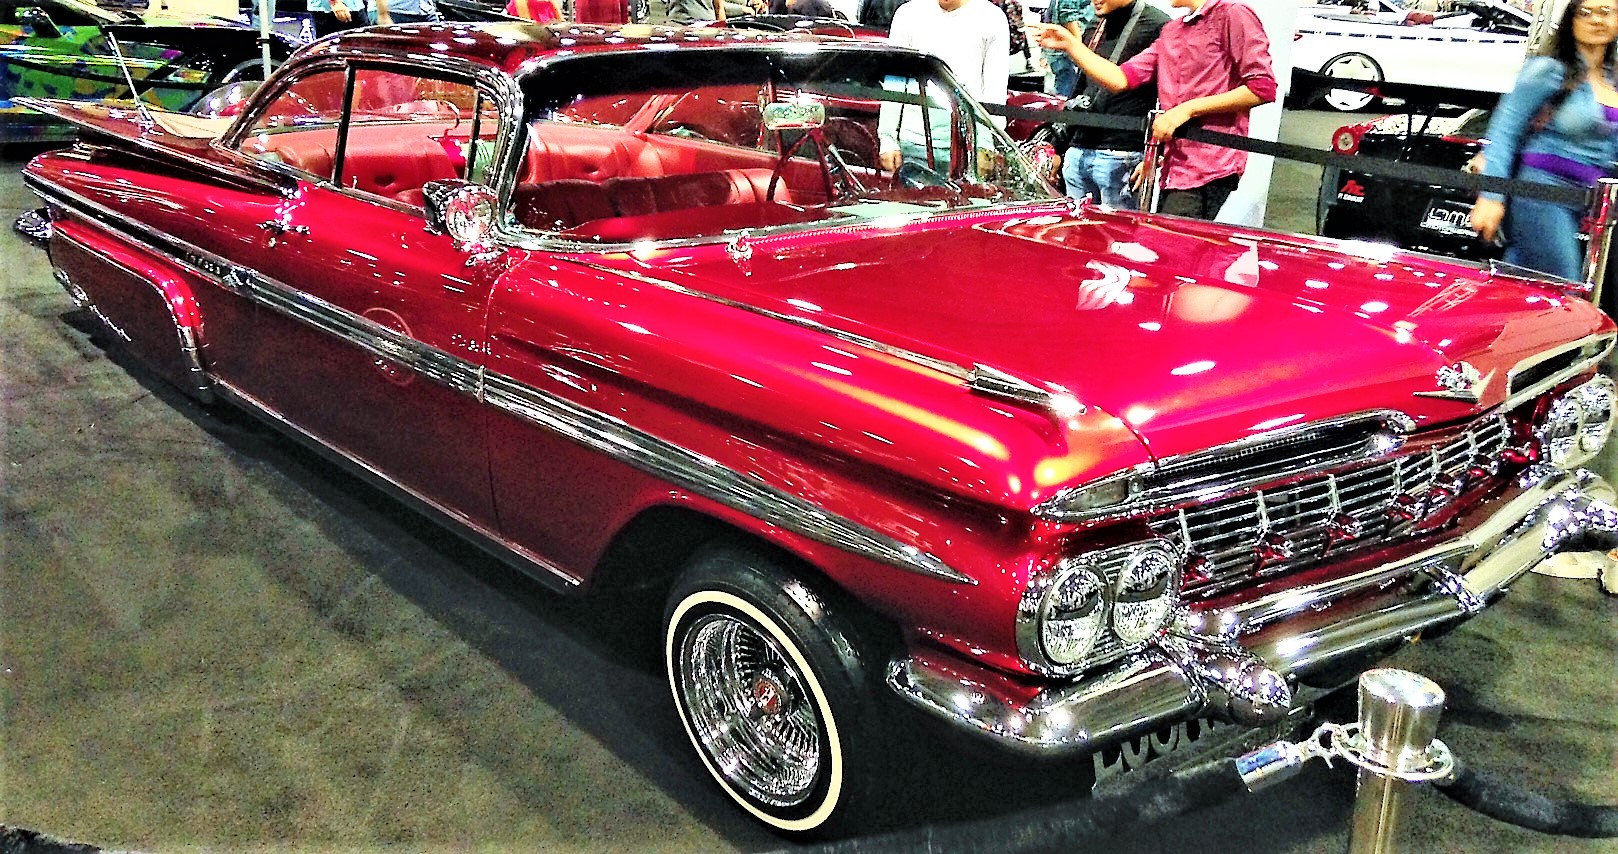 hight resolution of file 59 impala lowrider jpg